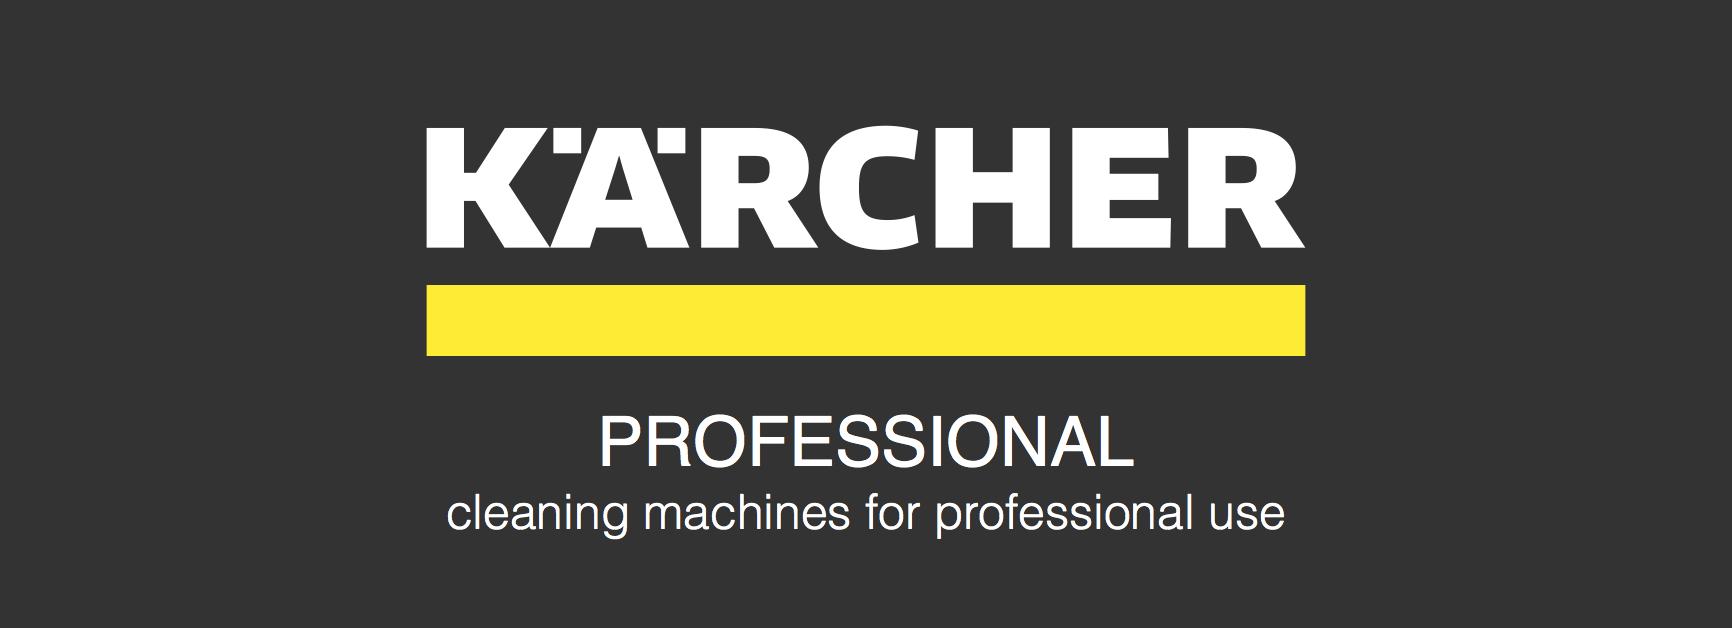 karcher-pro with IVS